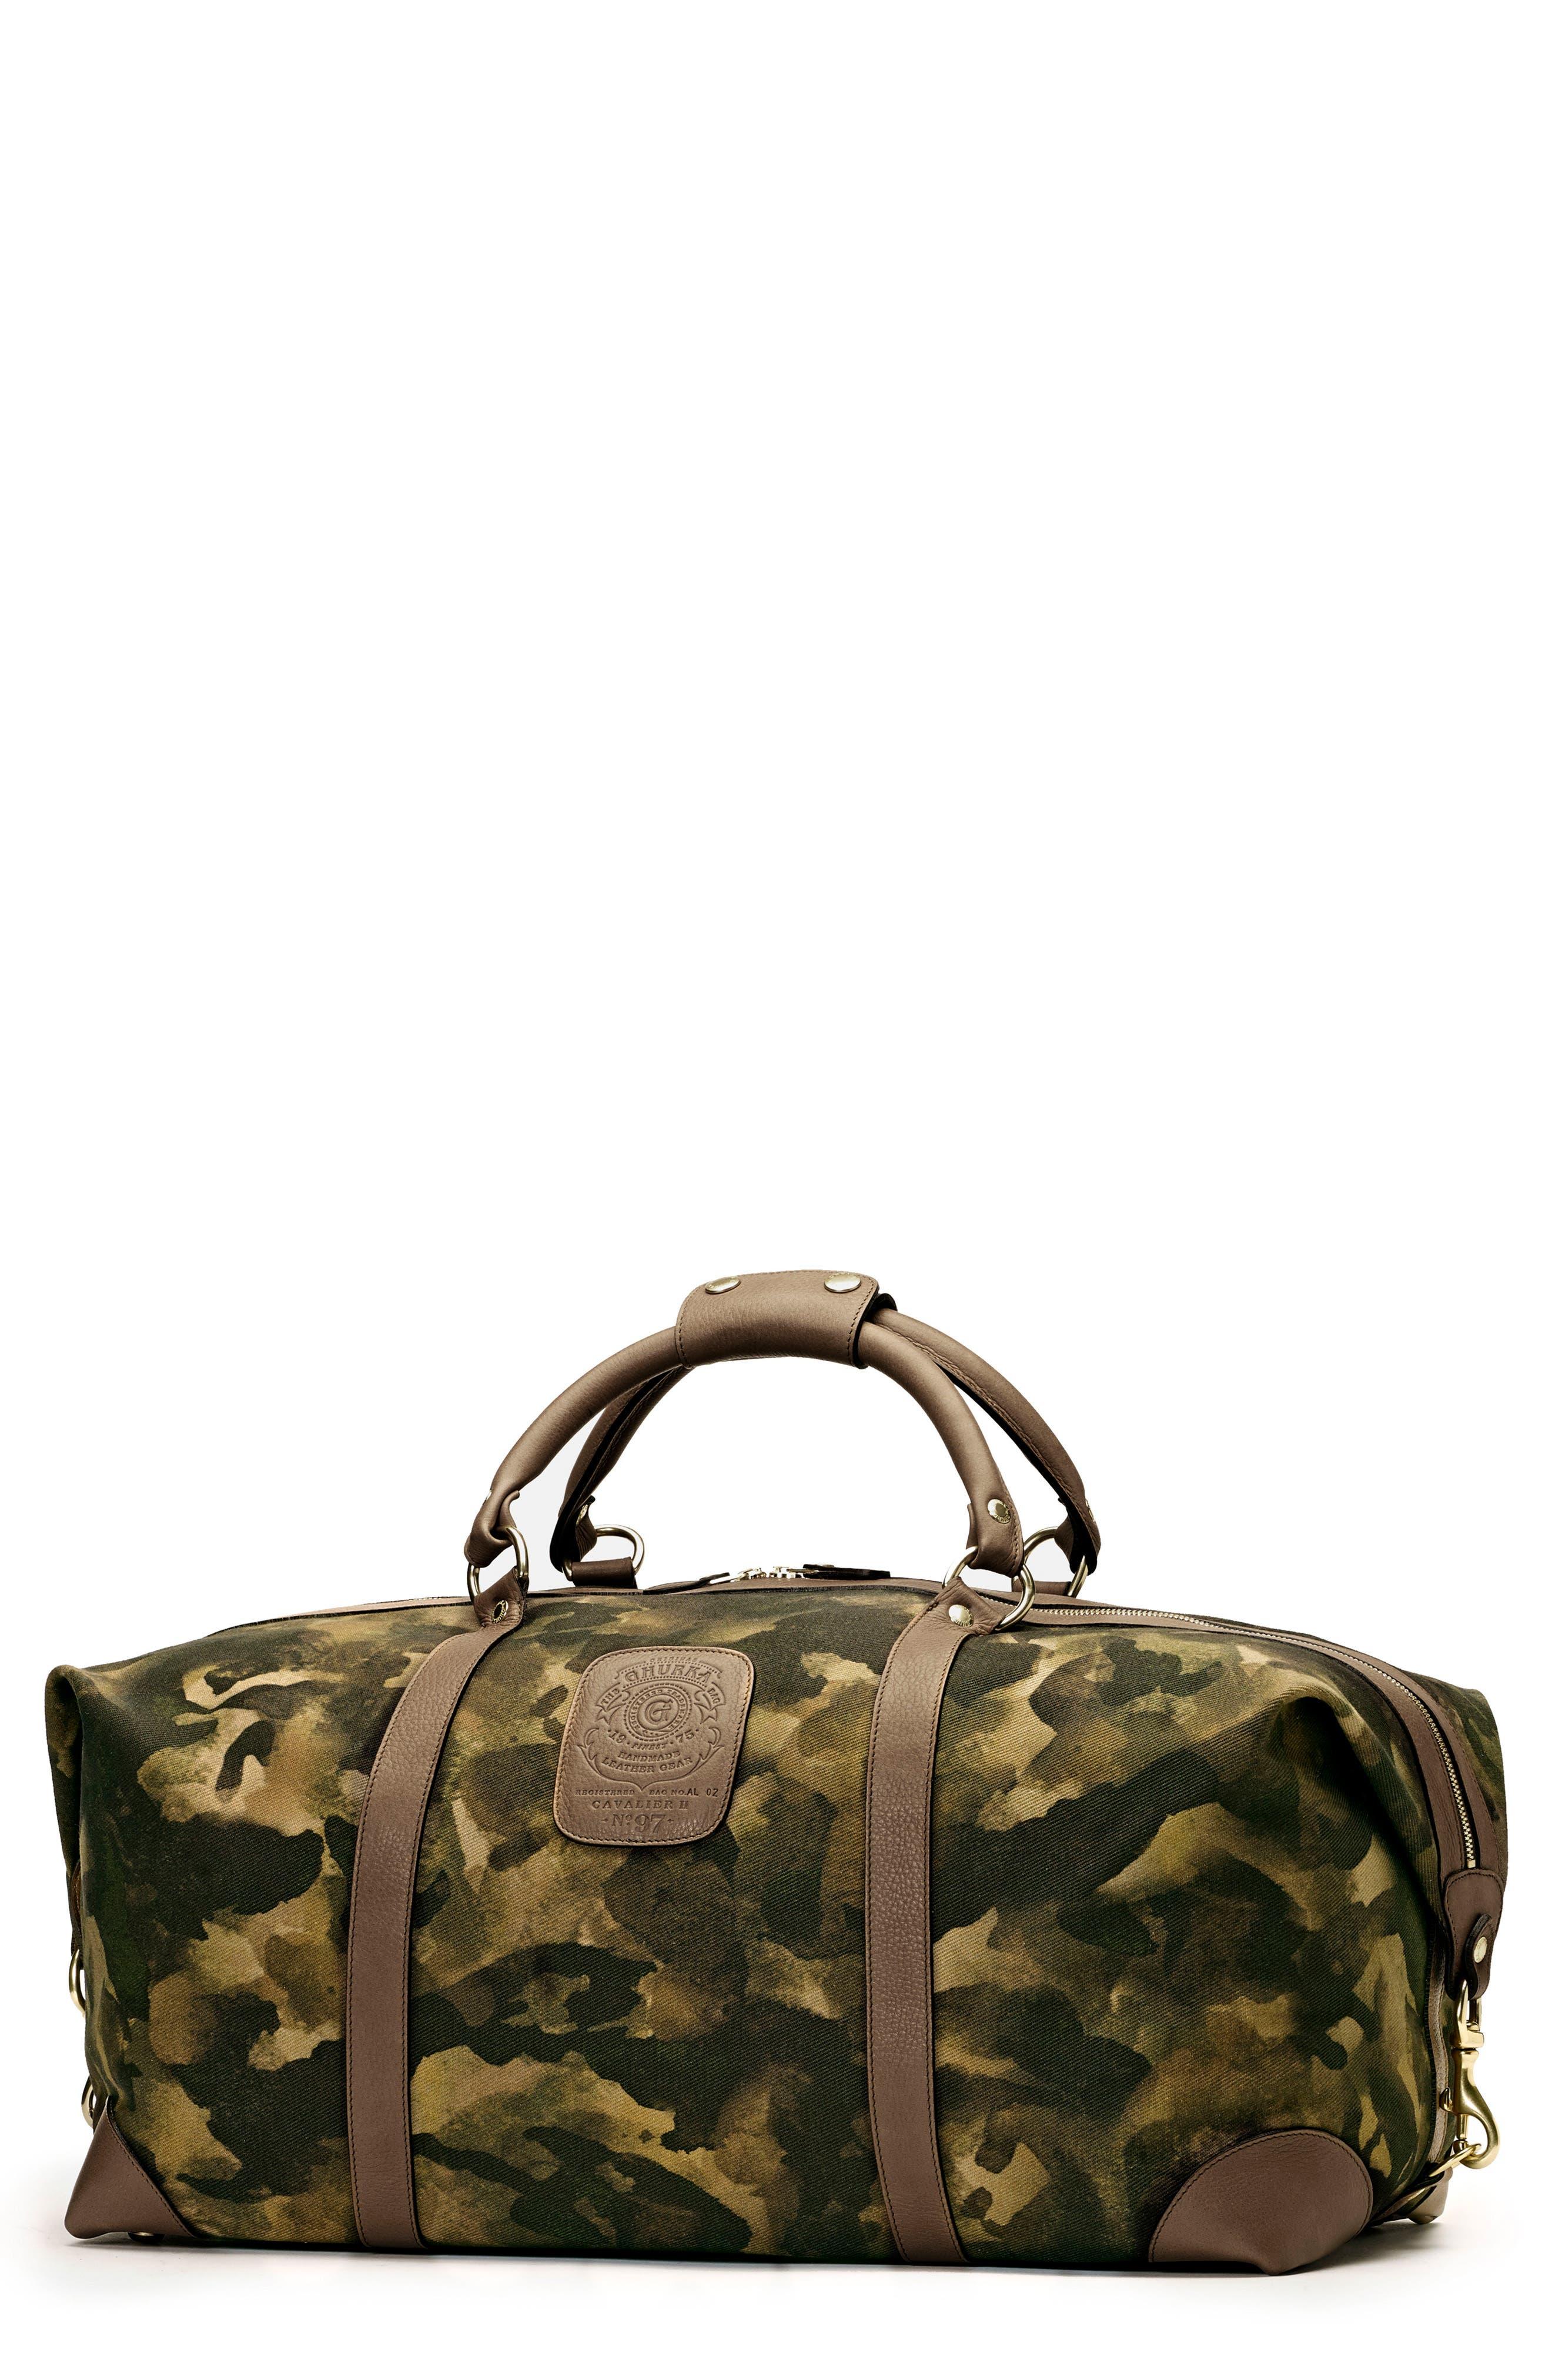 GHURKA Cavalier II Duffel Bag